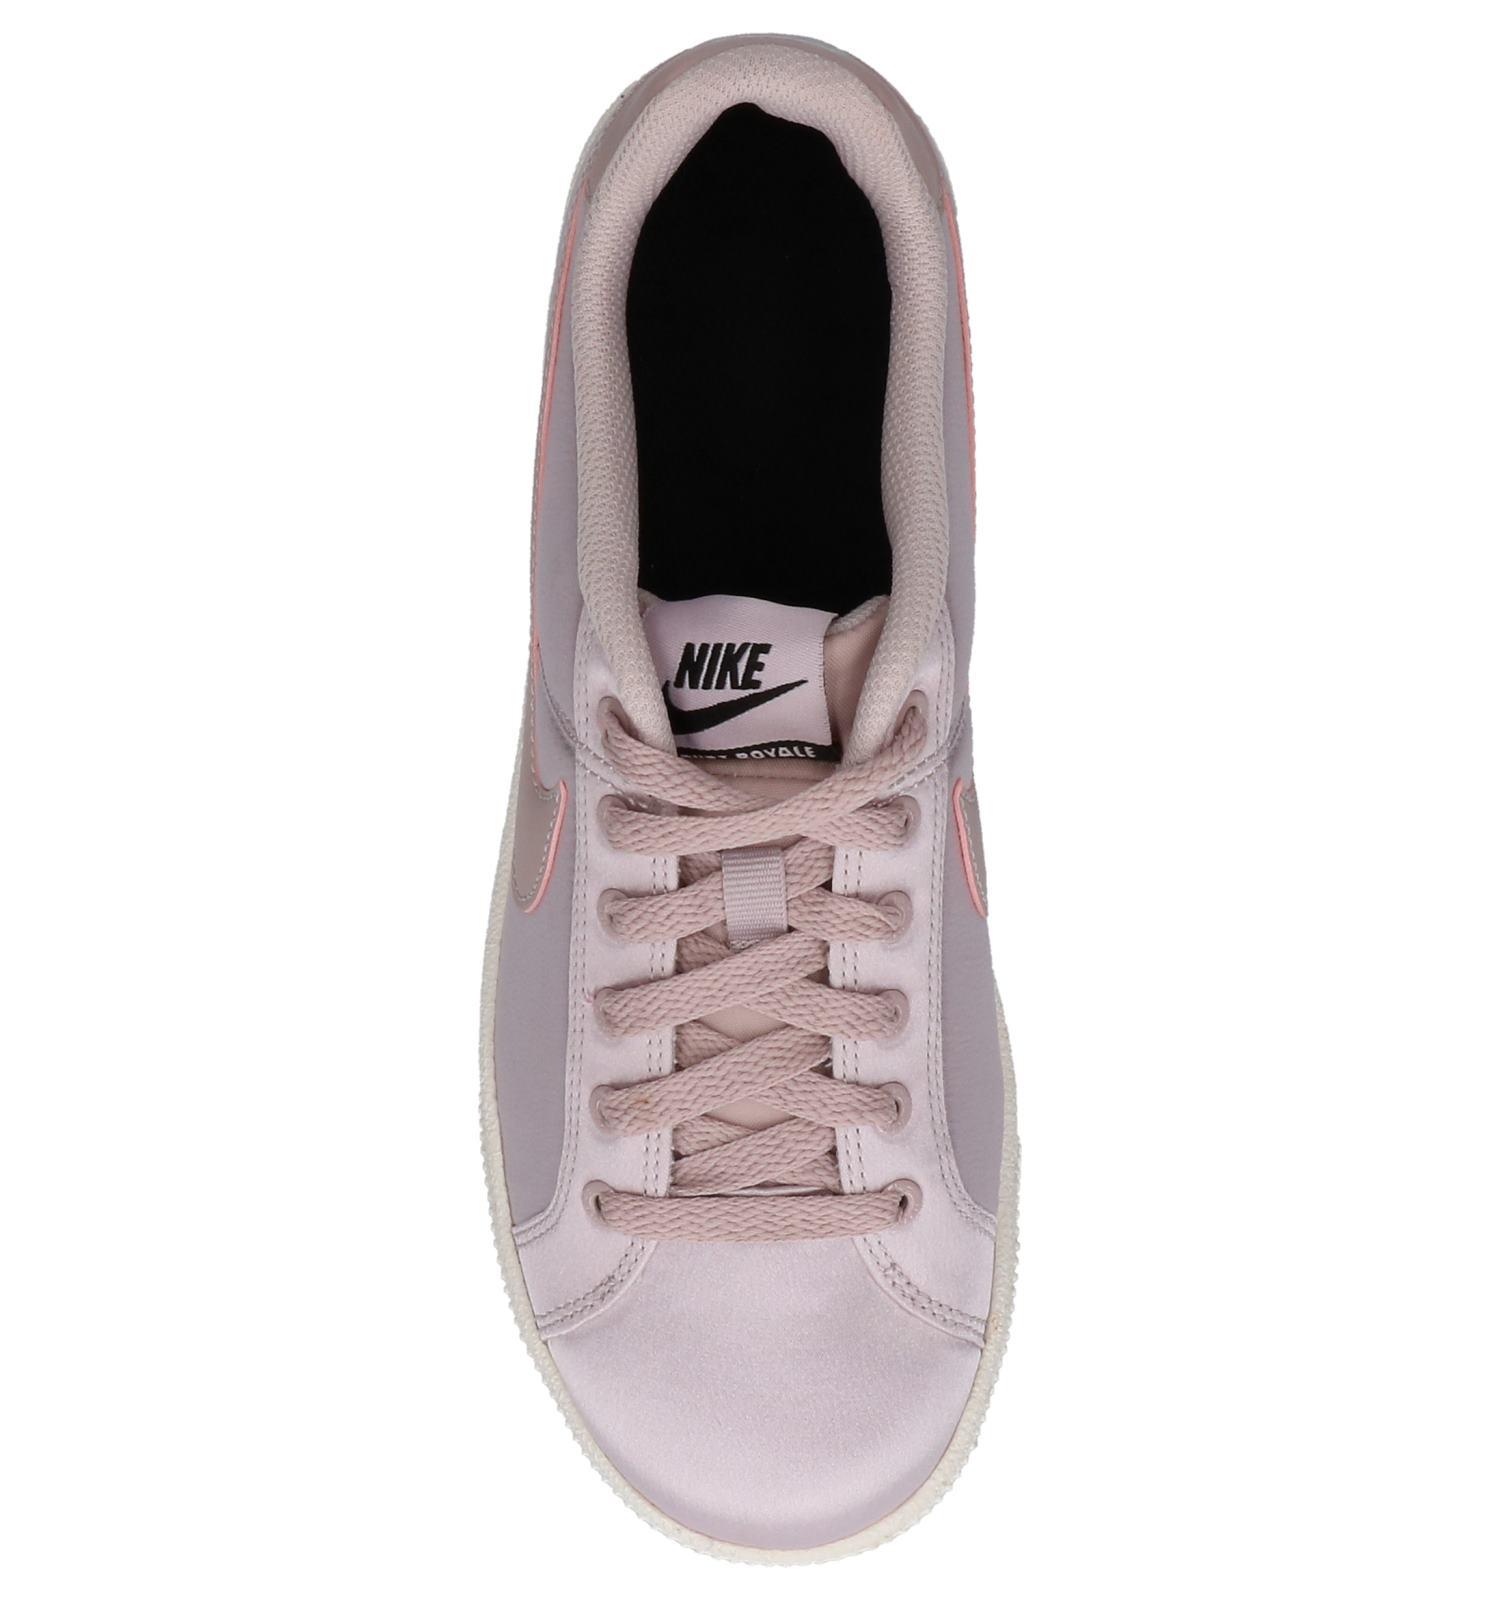 Nike Court Royale Sneakers Roze | SCHOENENTORFS.NL | Gratis ...